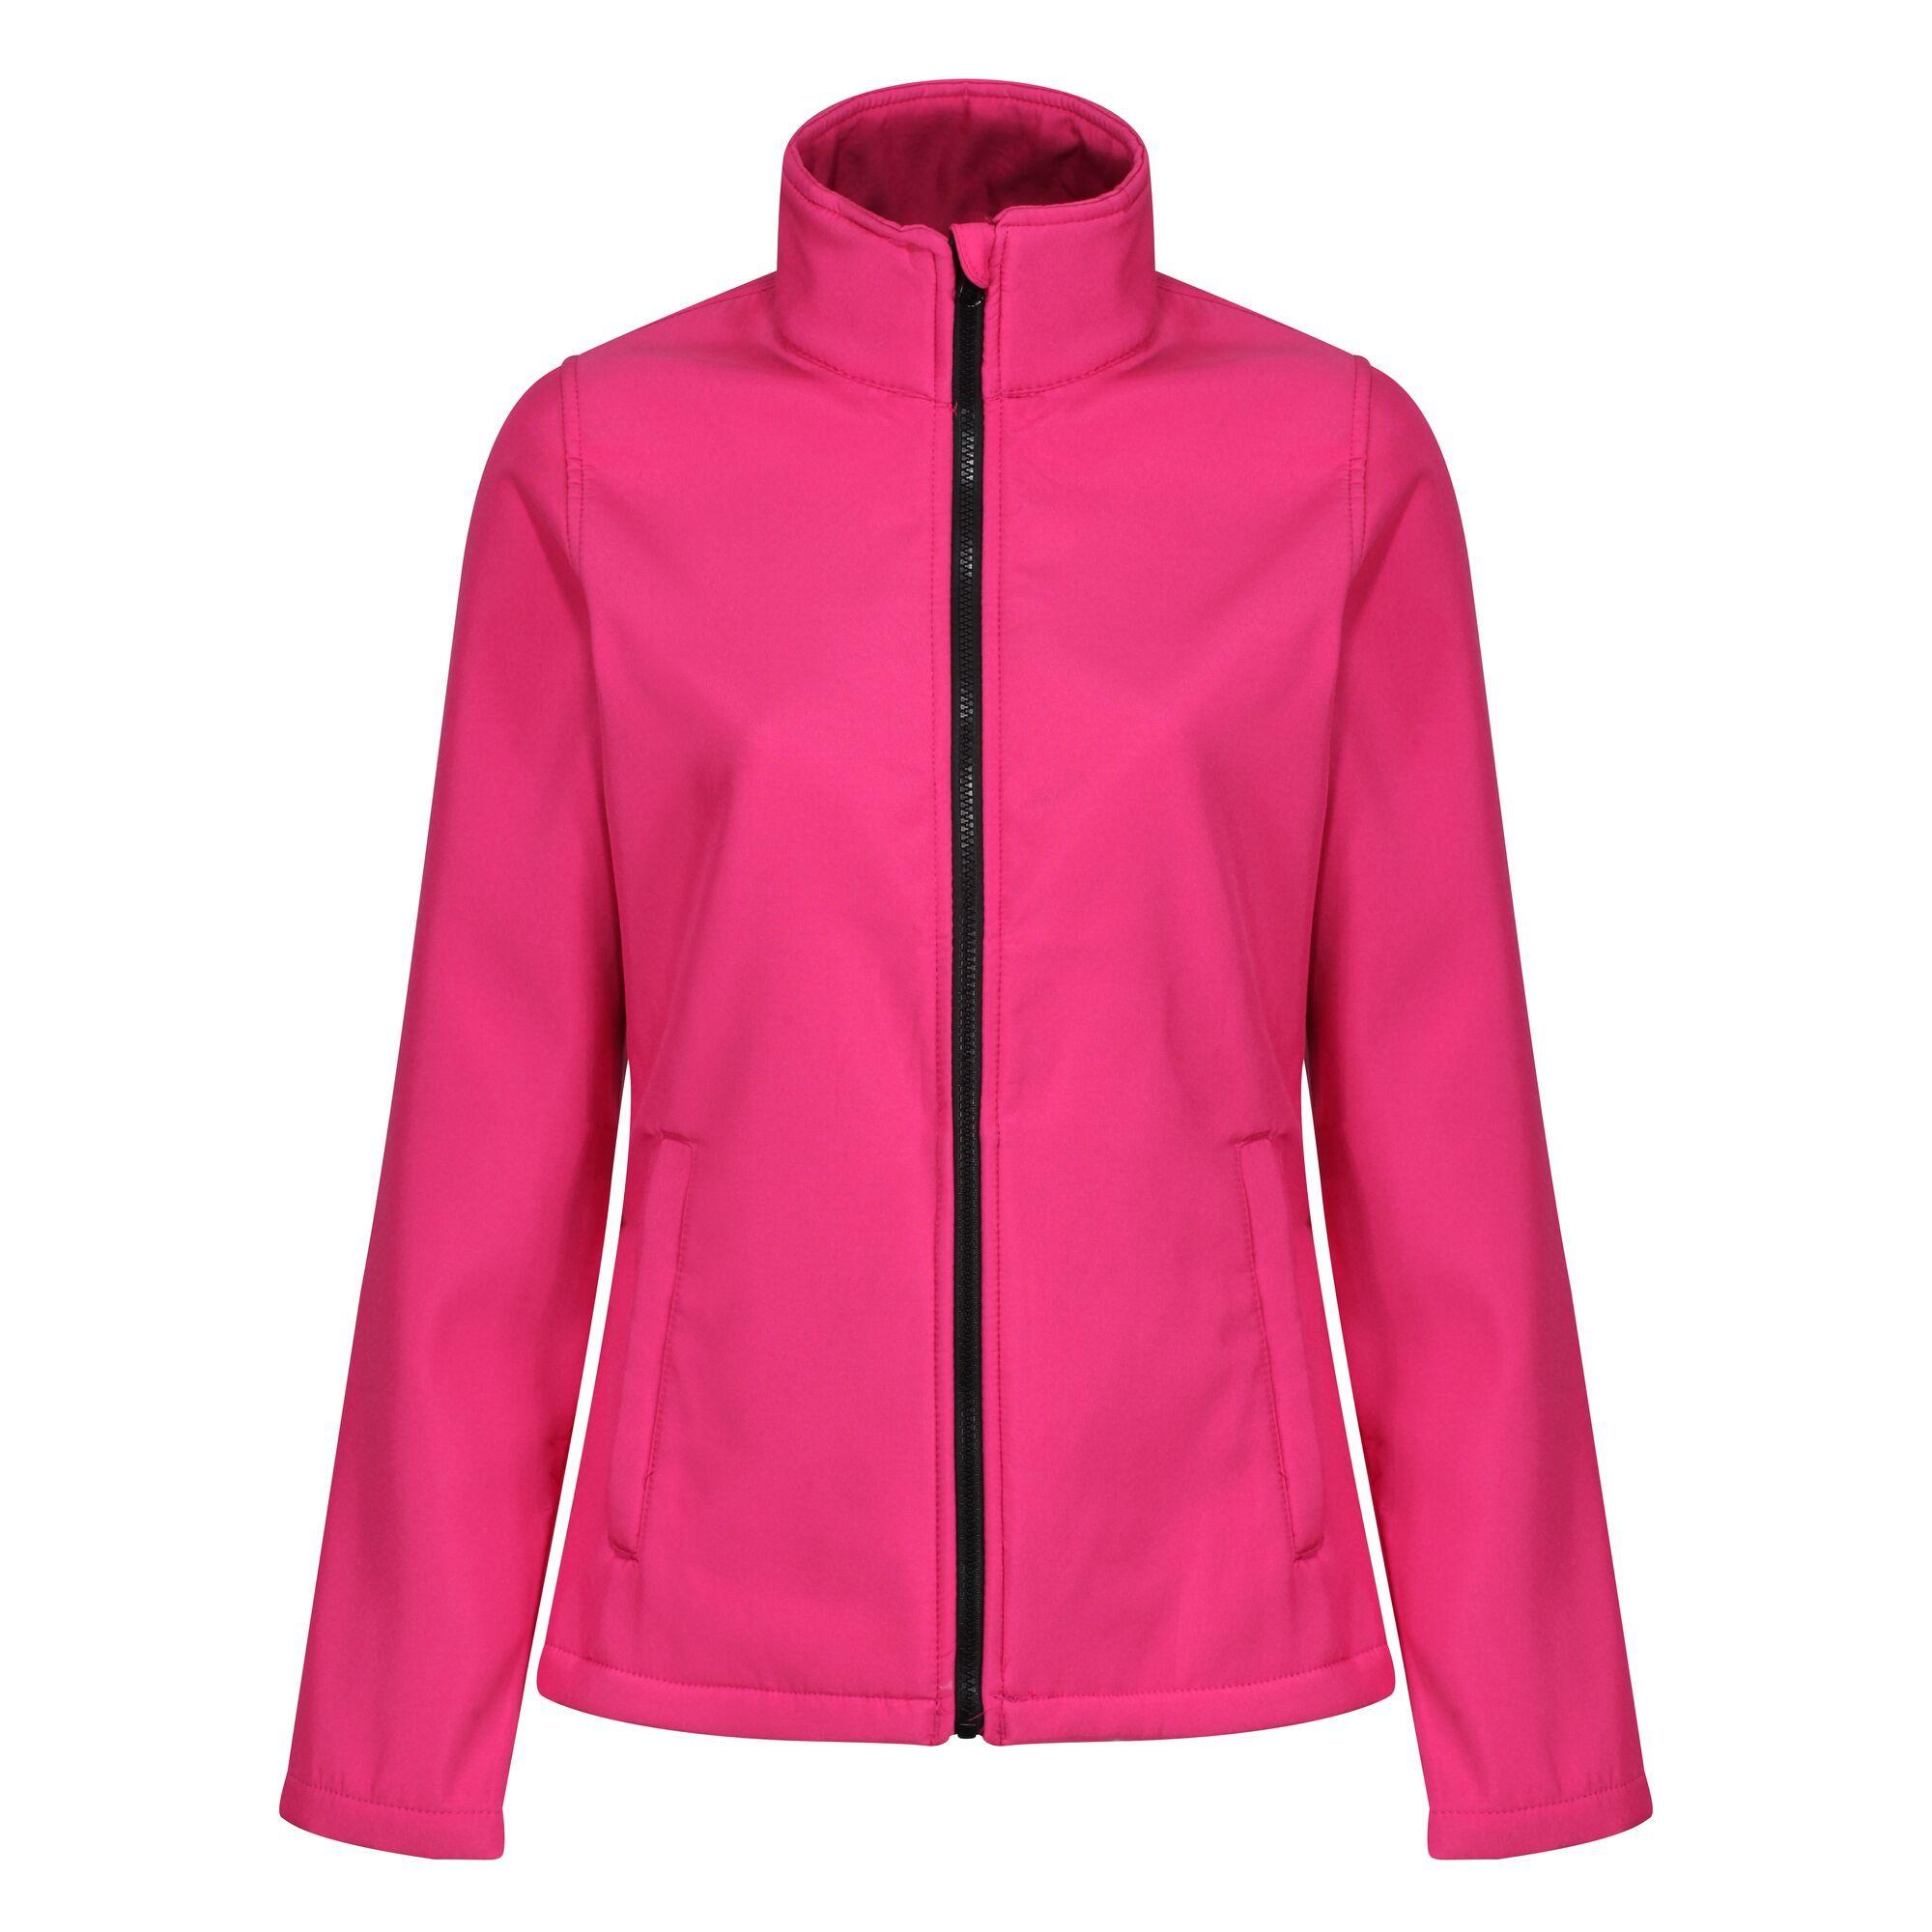 Regatta Standout Womens/Ladies Ablaze Printable Soft Shell Jacket (10) (French Blue/Navy)